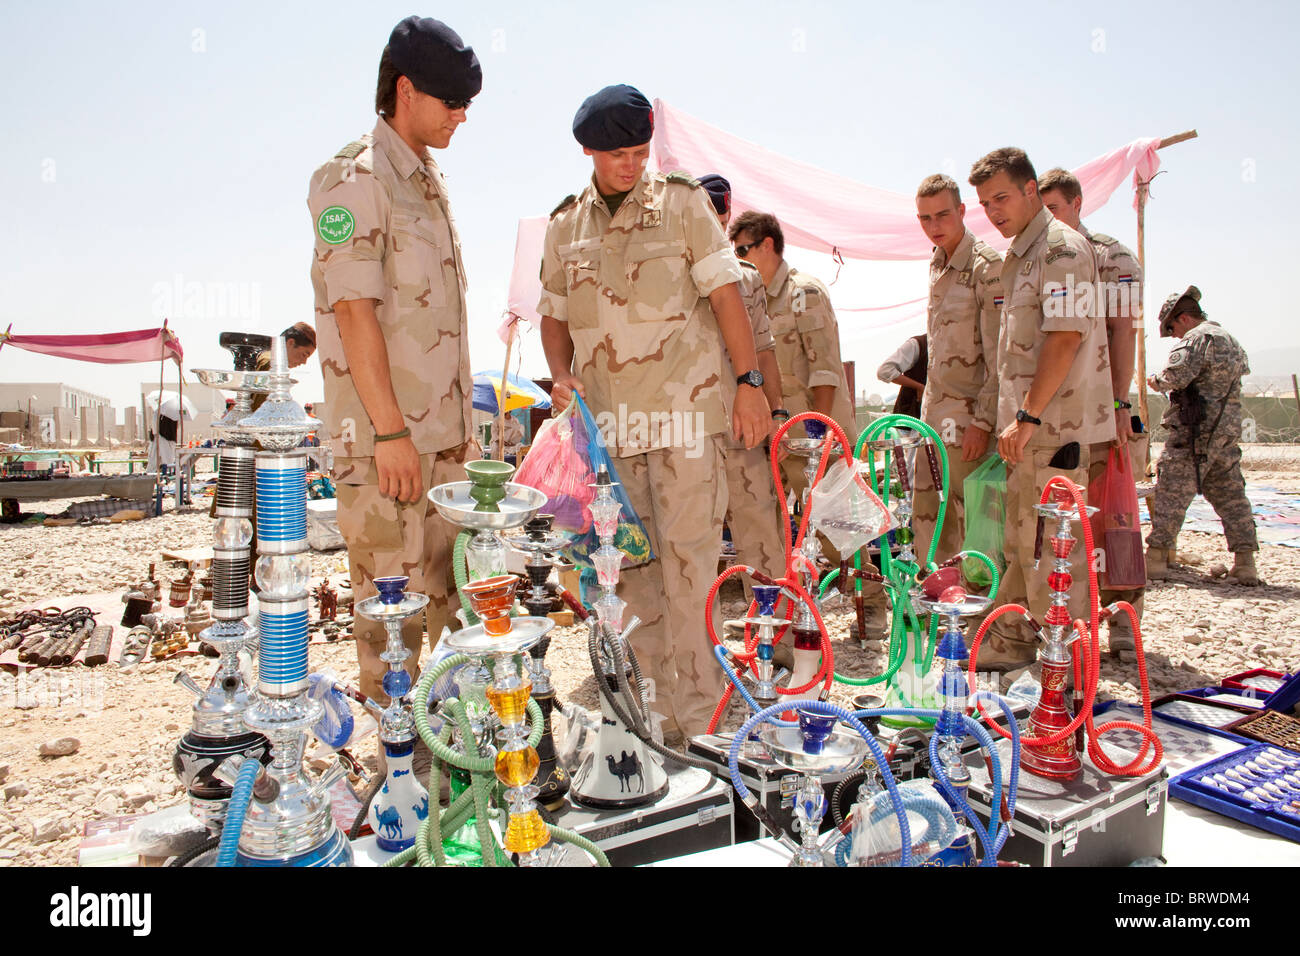 souvenir market outside military base in Uruzgan - Stock Image